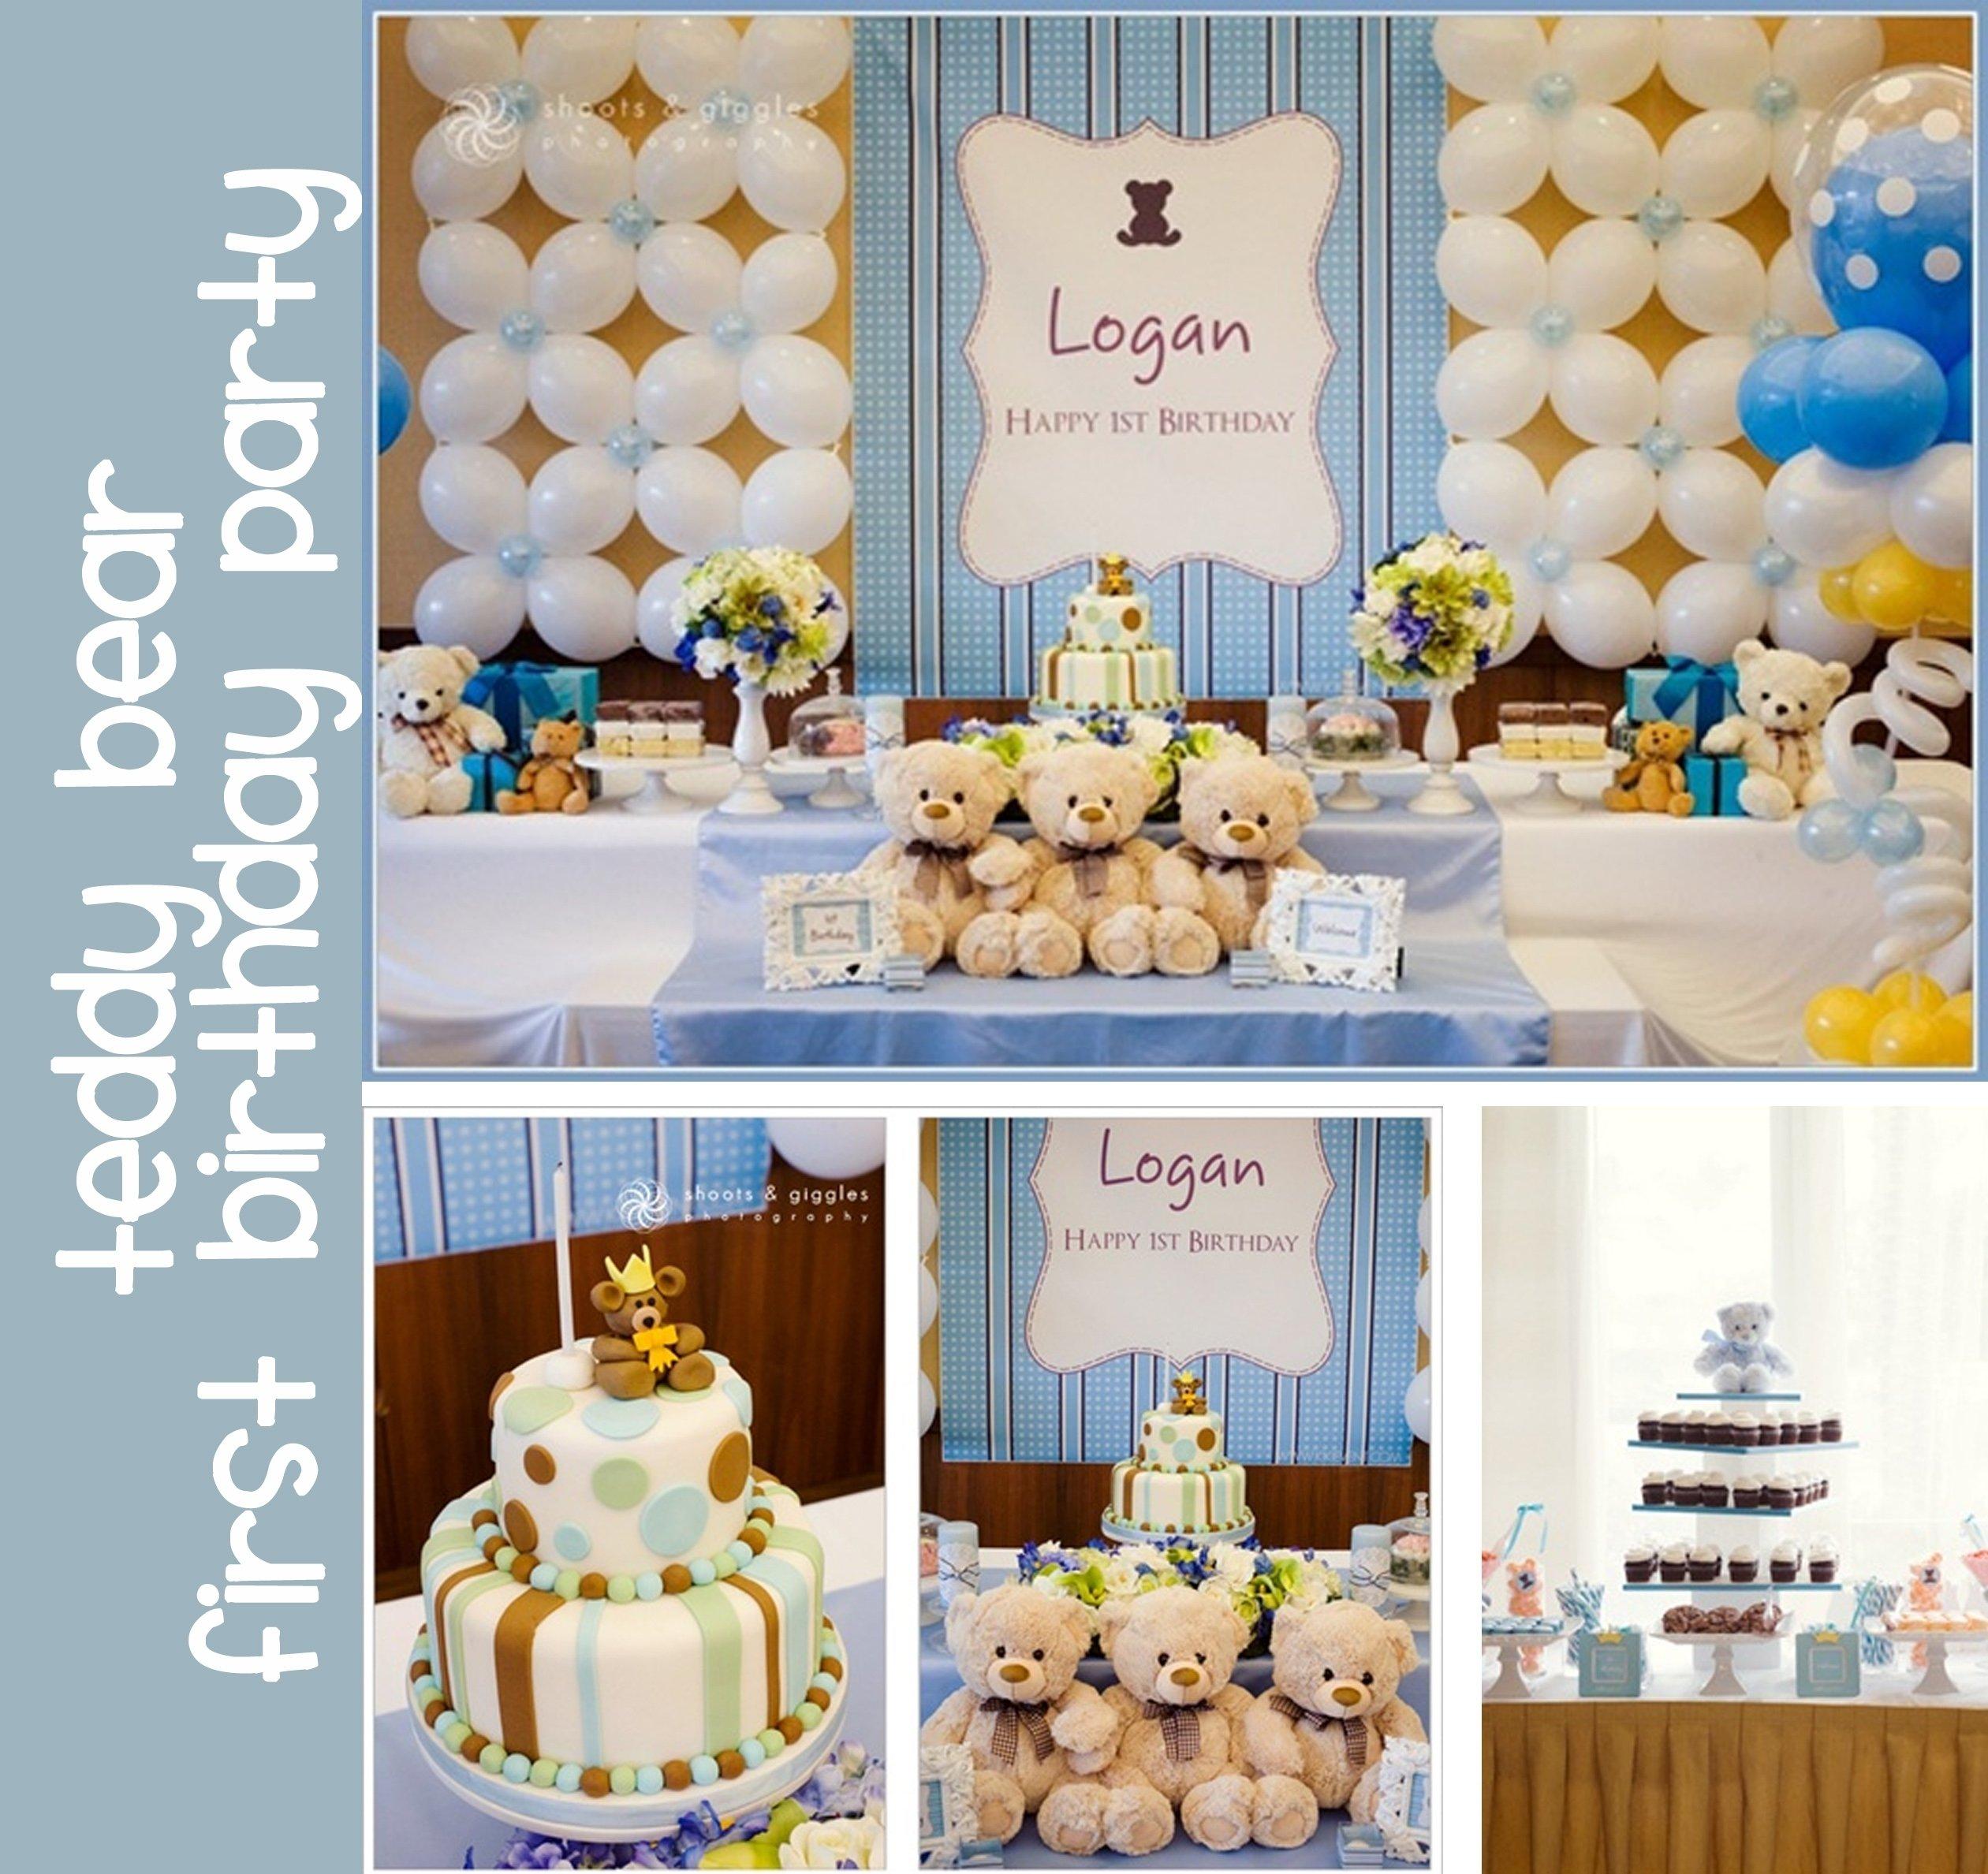 10 Attractive First Birthday Ideas For Boys baby first birthday ideas for boy first birthday teddy bear theme 22 2021